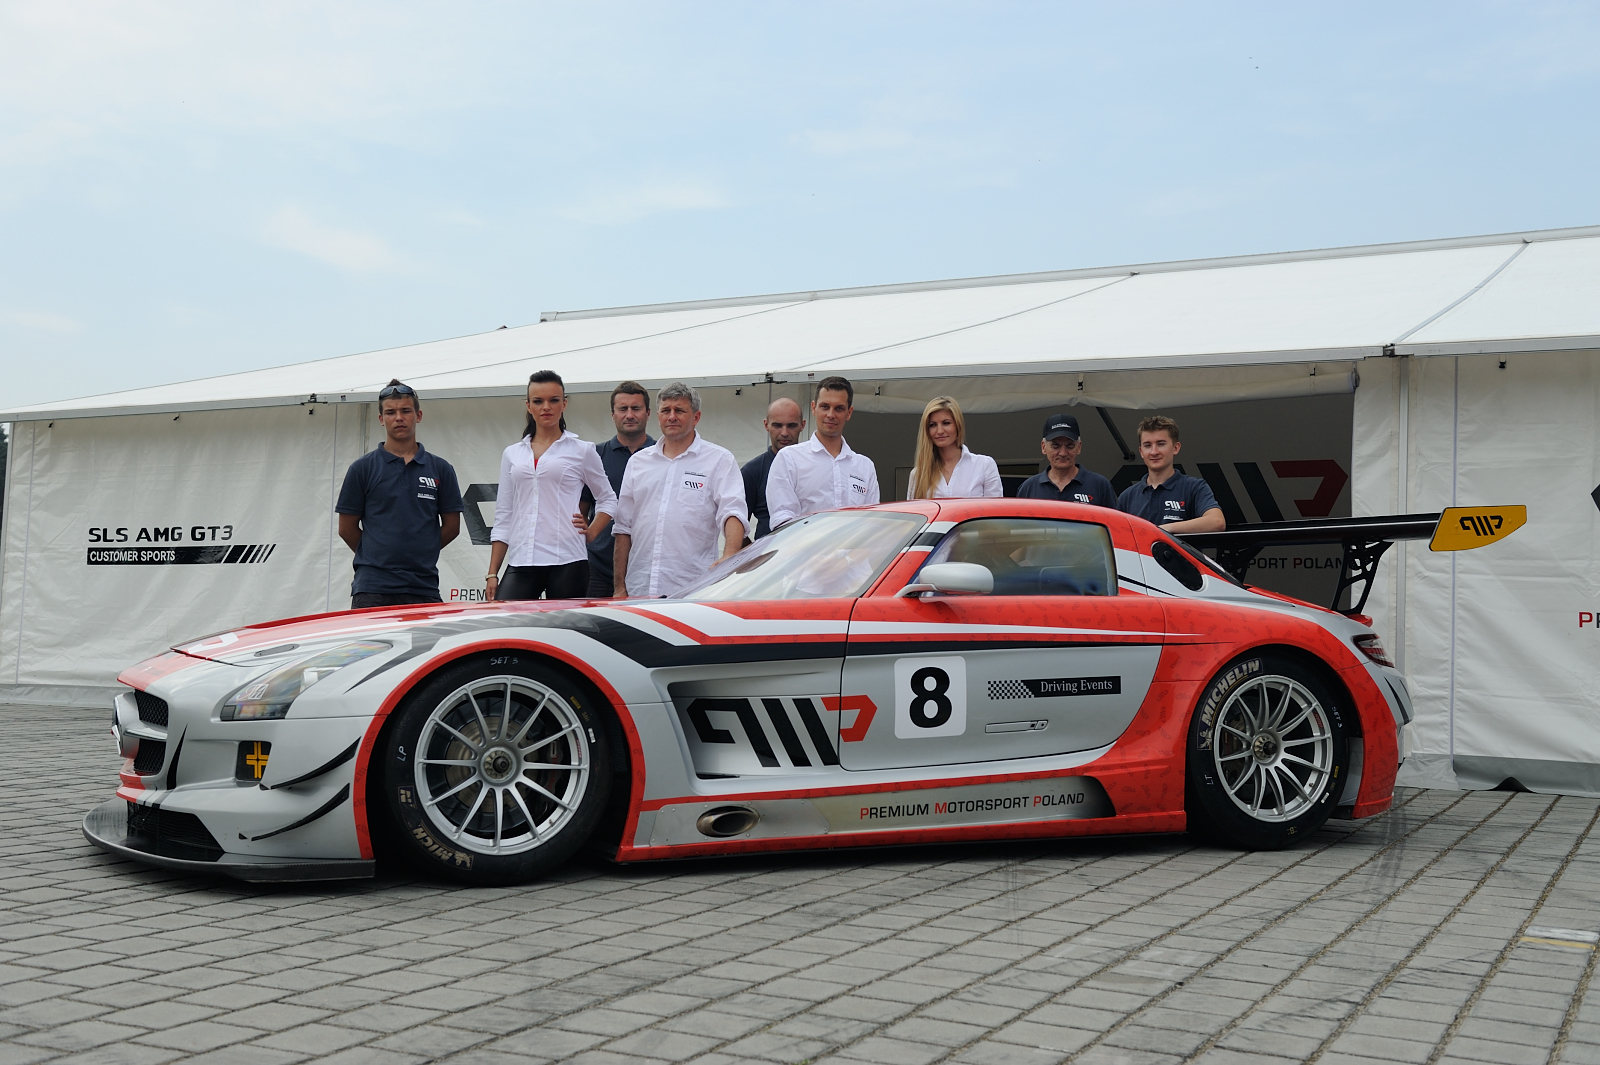 Mercedes benz sls amg gt3 vehicles simraceway community for Mercedes benz race car